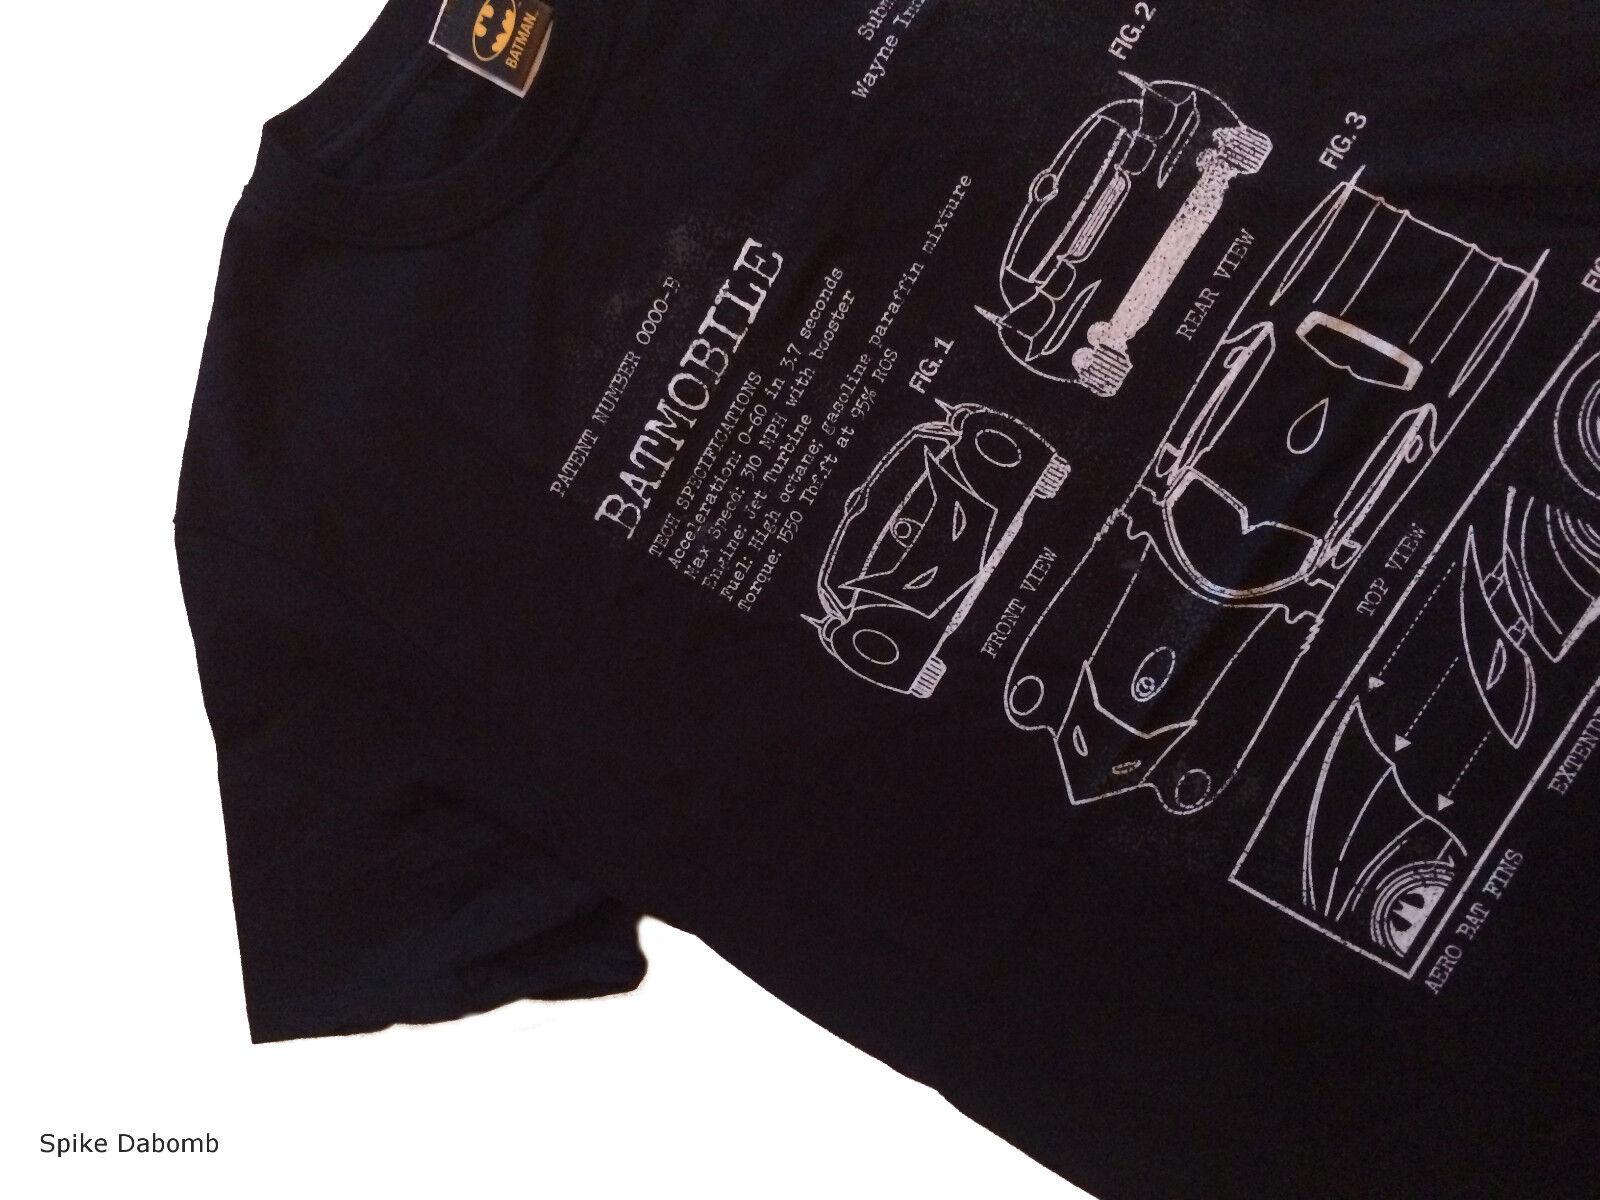 Officiel DC Industries Comics-Batman Batmobile Wayne Industries DC Plan T-shirt noir (neuf) bdd288